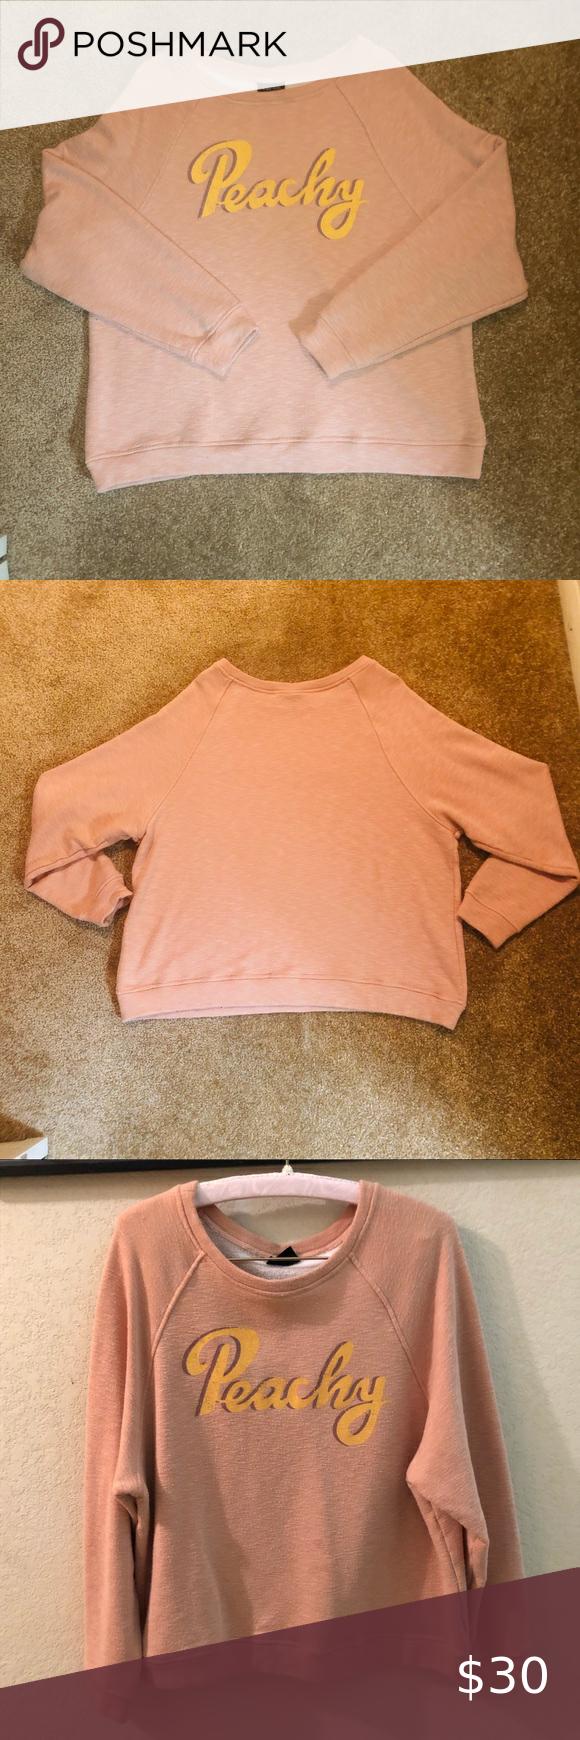 Blank Paige Peachy Peach Crewneck Sweatshirt Sweatshirts Crew Neck Sweatshirt Pink Crewneck Sweatshirt [ 1740 x 580 Pixel ]